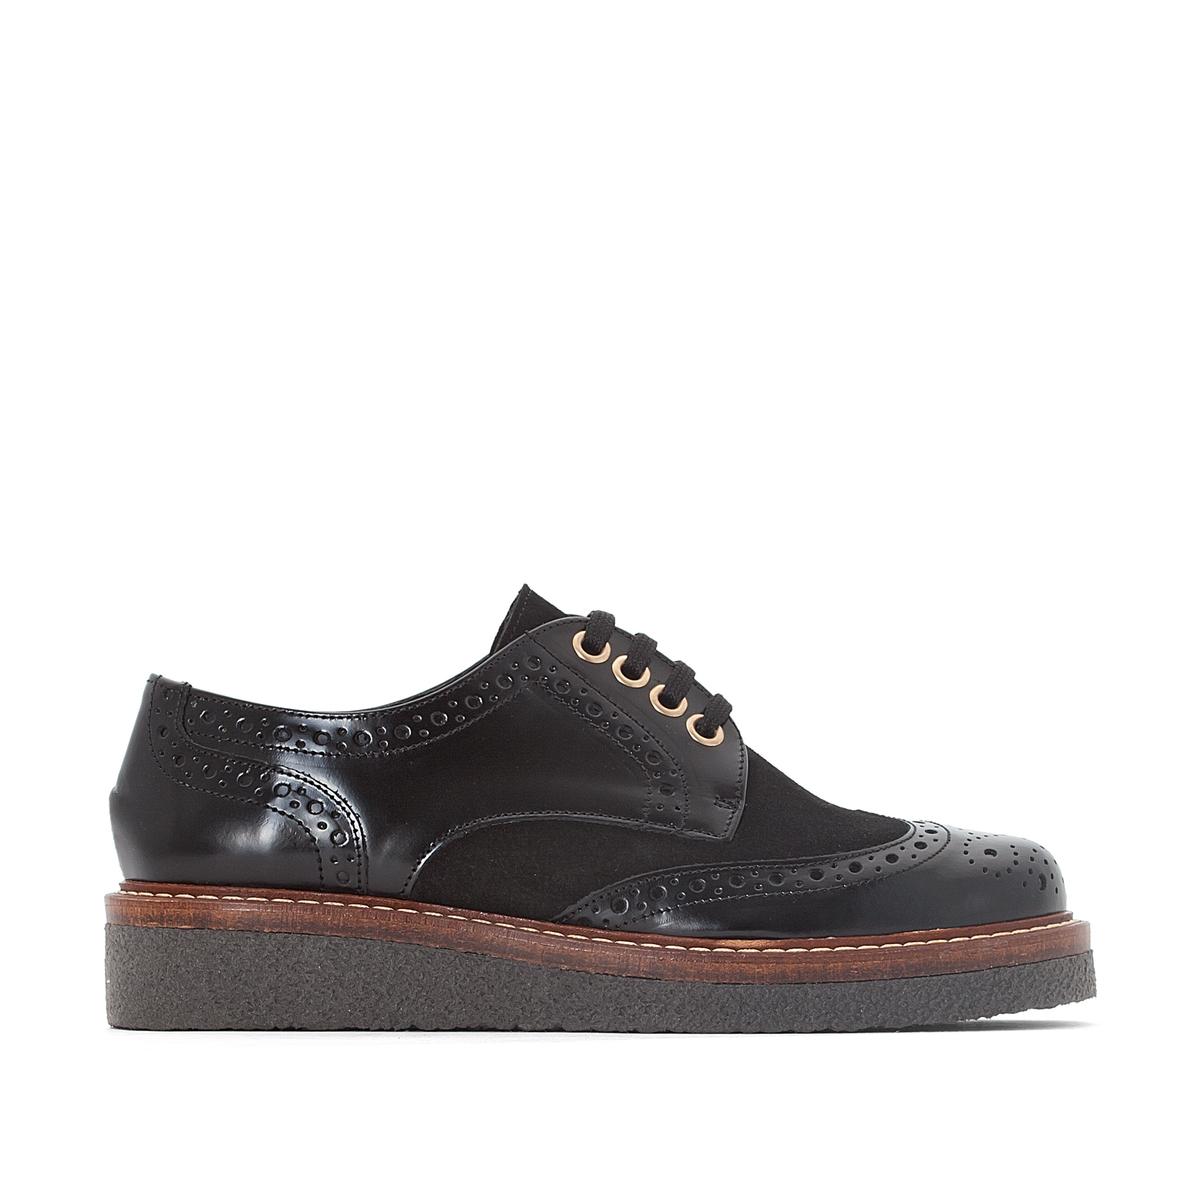 Ботинки-дерби на шнуровке ботинки дерби malika